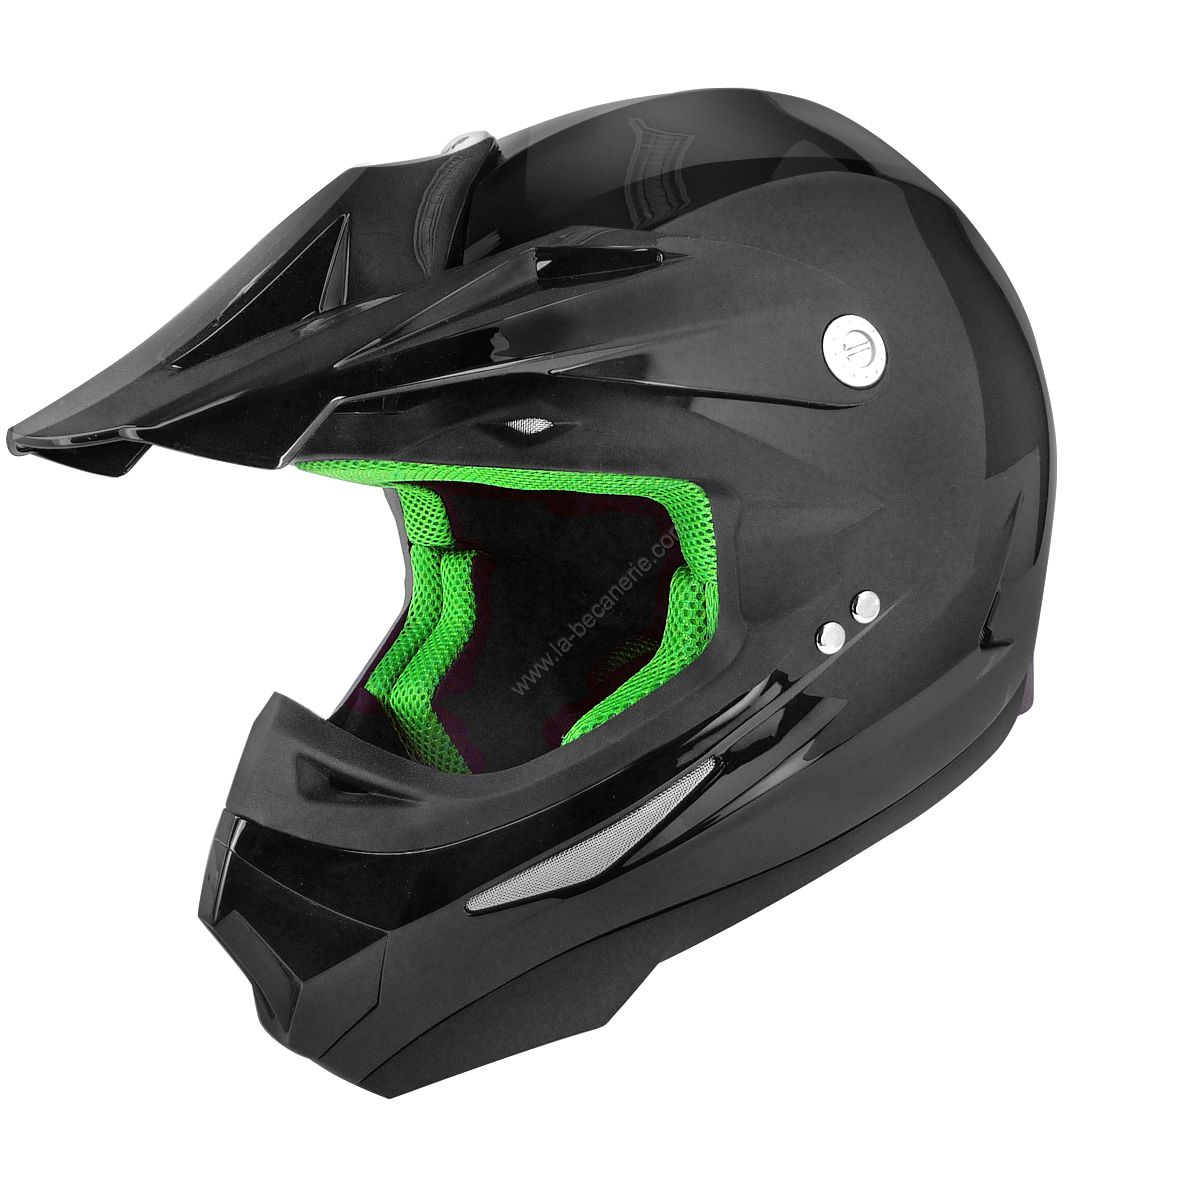 Casque moto ksk helmets